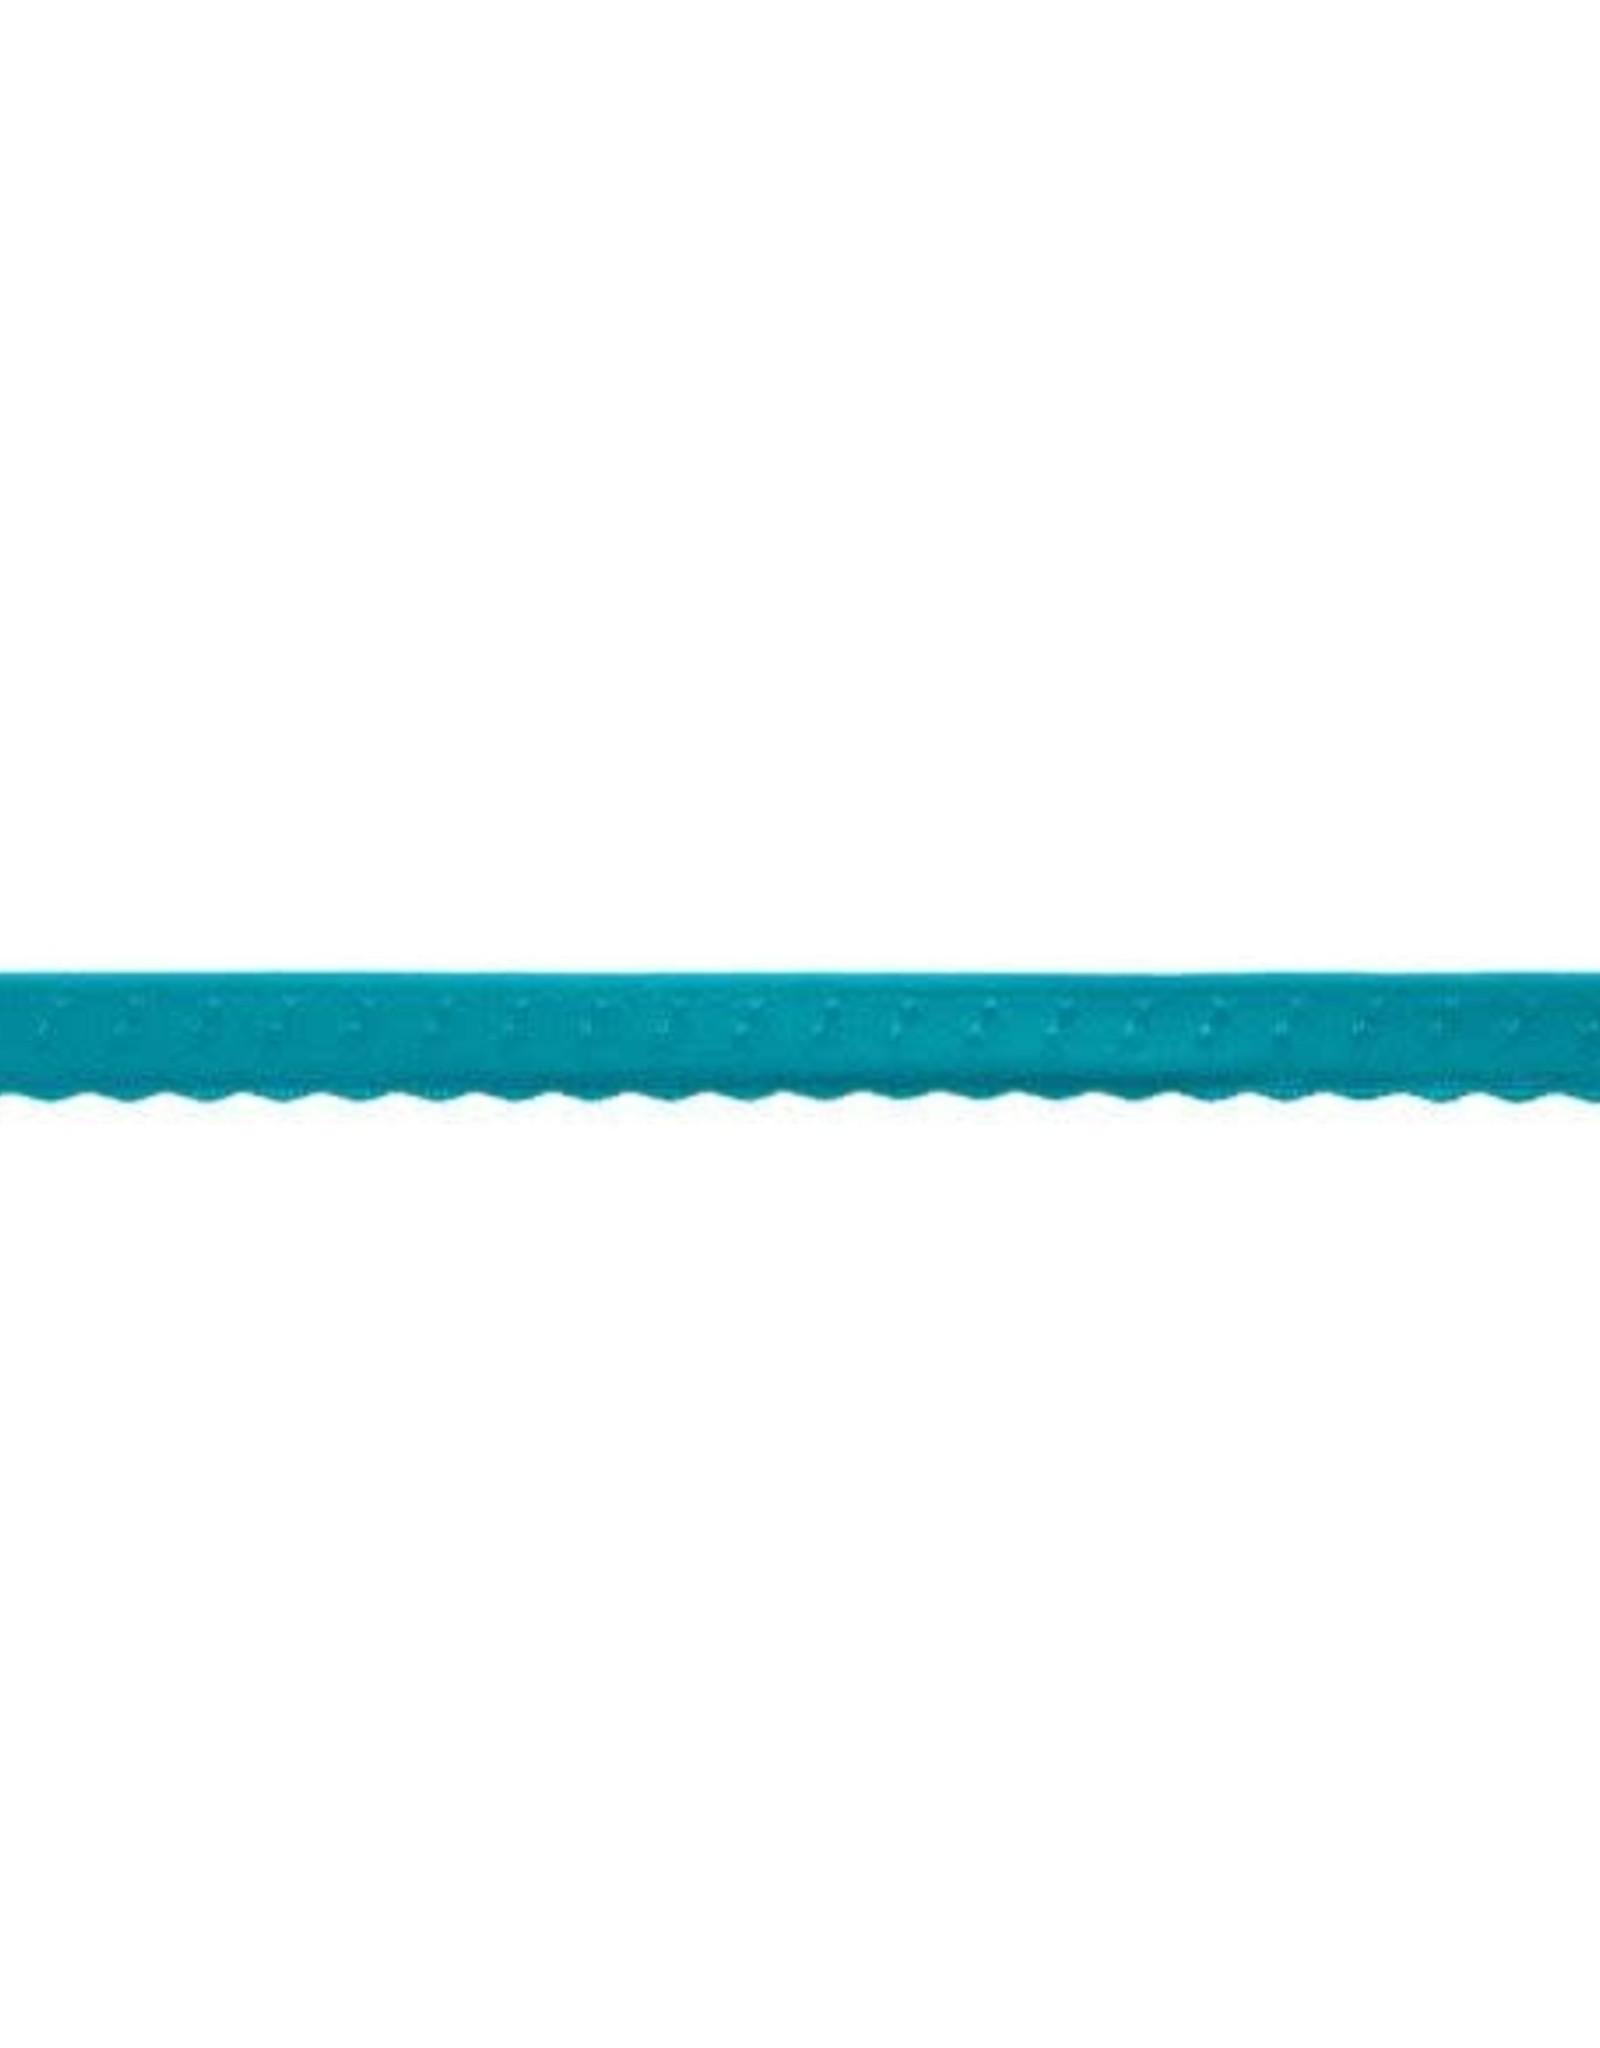 Lingerie el, groenblauw 444